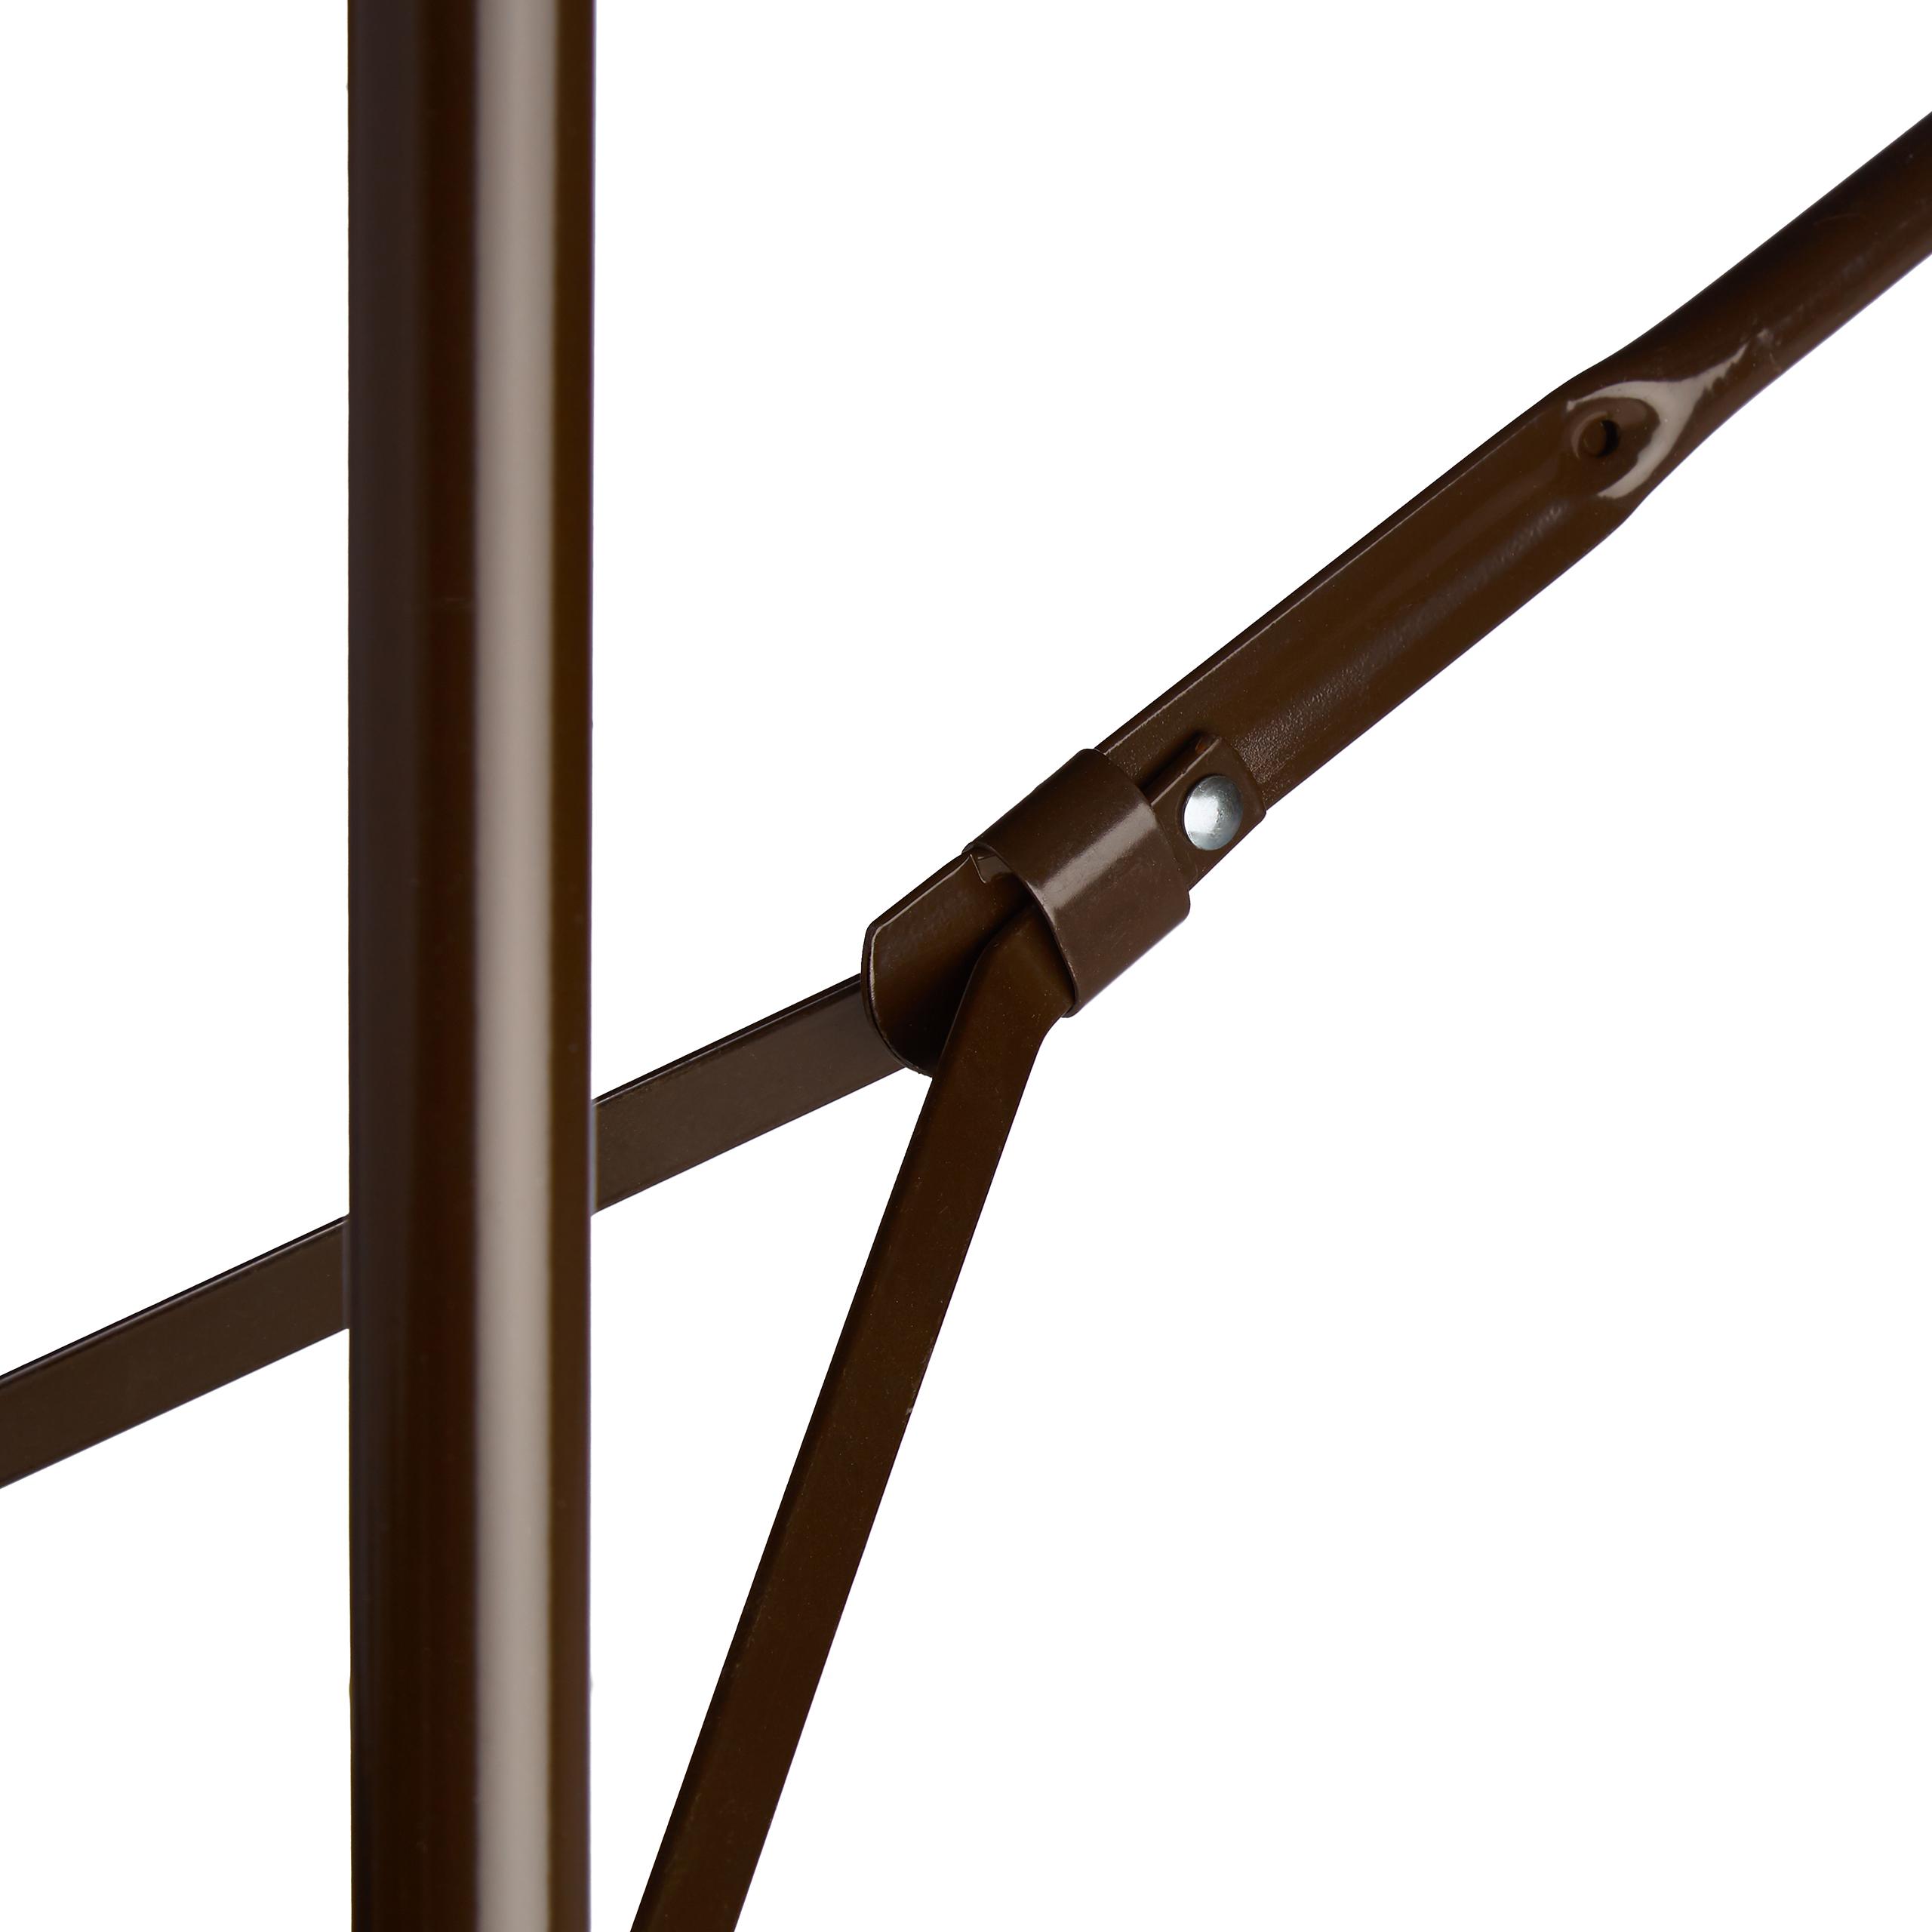 Bierzeltgarnitur-klappbar-BASTIAN-in-Rattan-Optik-Gartenmoebel-Set-Biertisch Indexbild 8